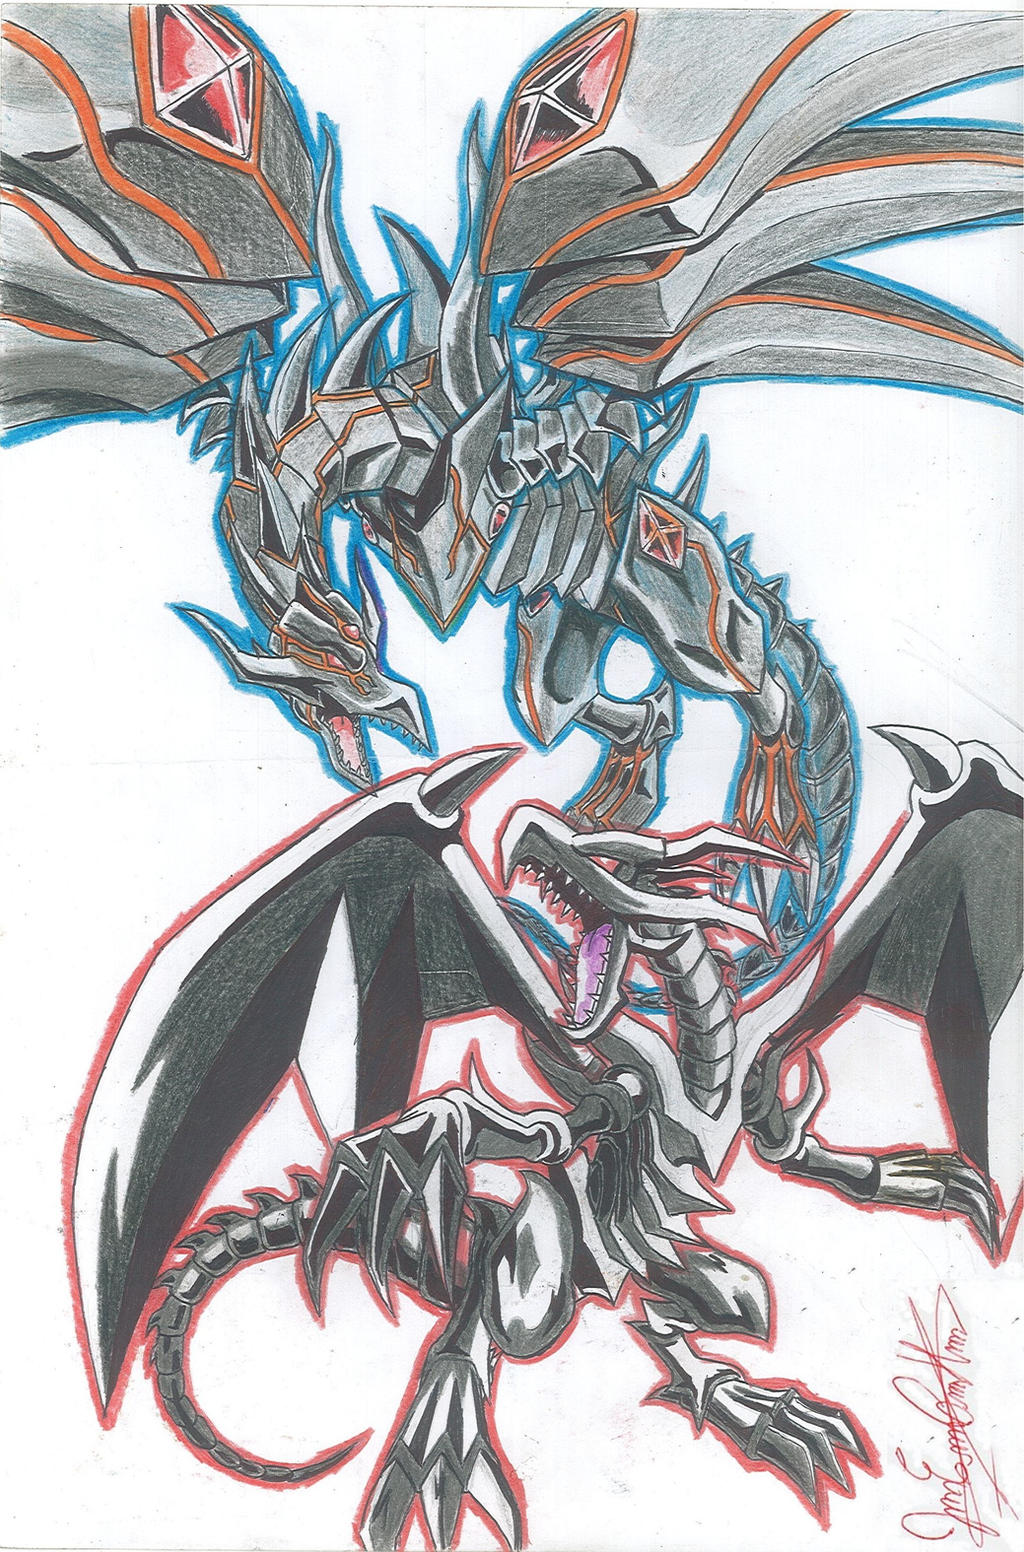 yugioh red eyes darkness metal dragon wallpaper www